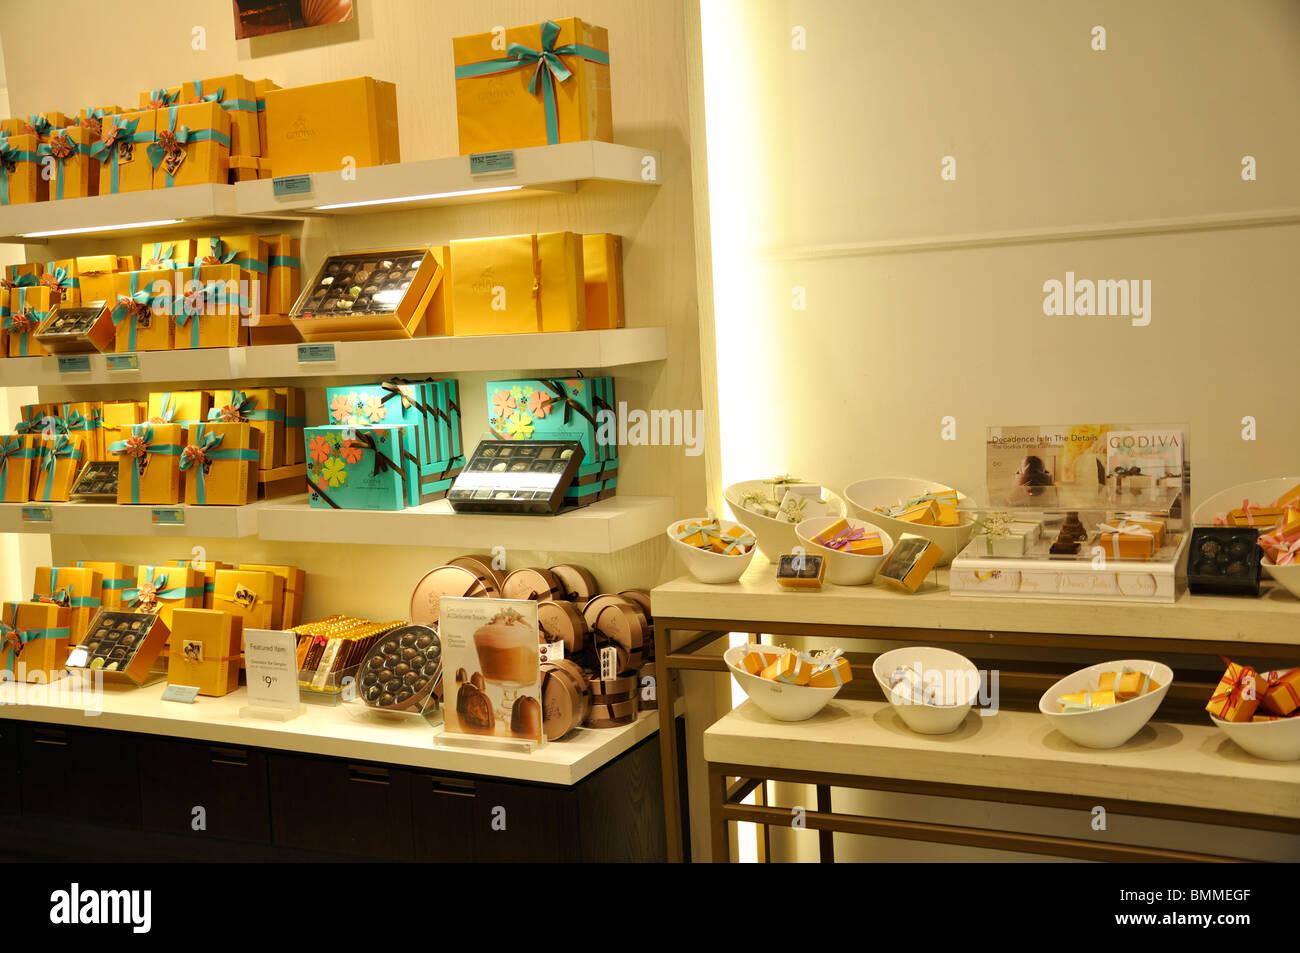 Godiva chocolate store, New York, USA Stock Photo, Royalty Free ...